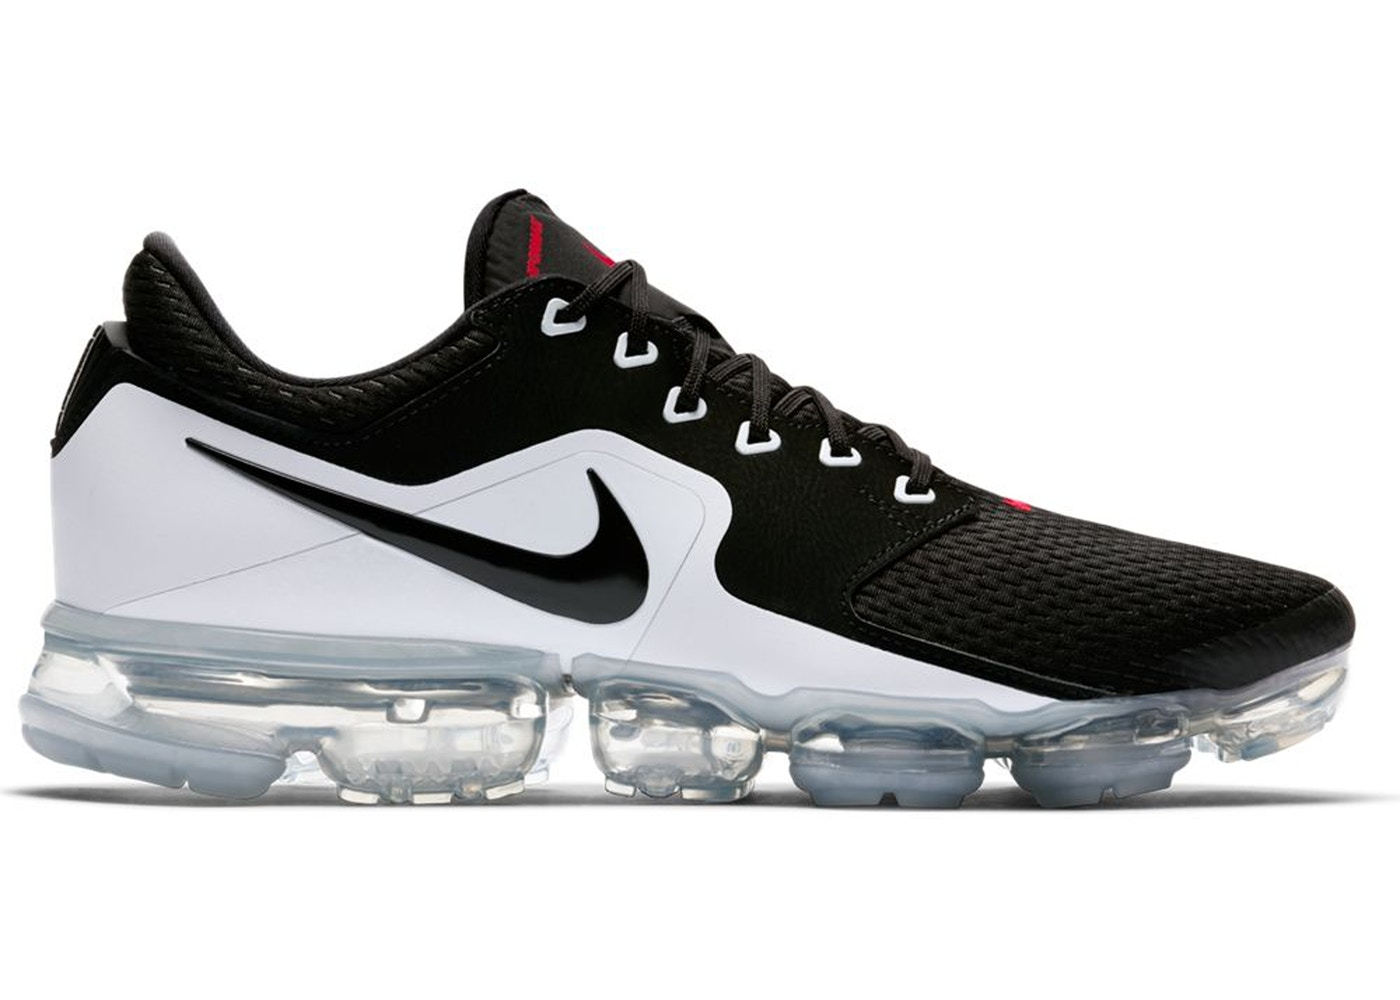 separation shoes bfce6 5f6ba Air VaporMax CS Black White